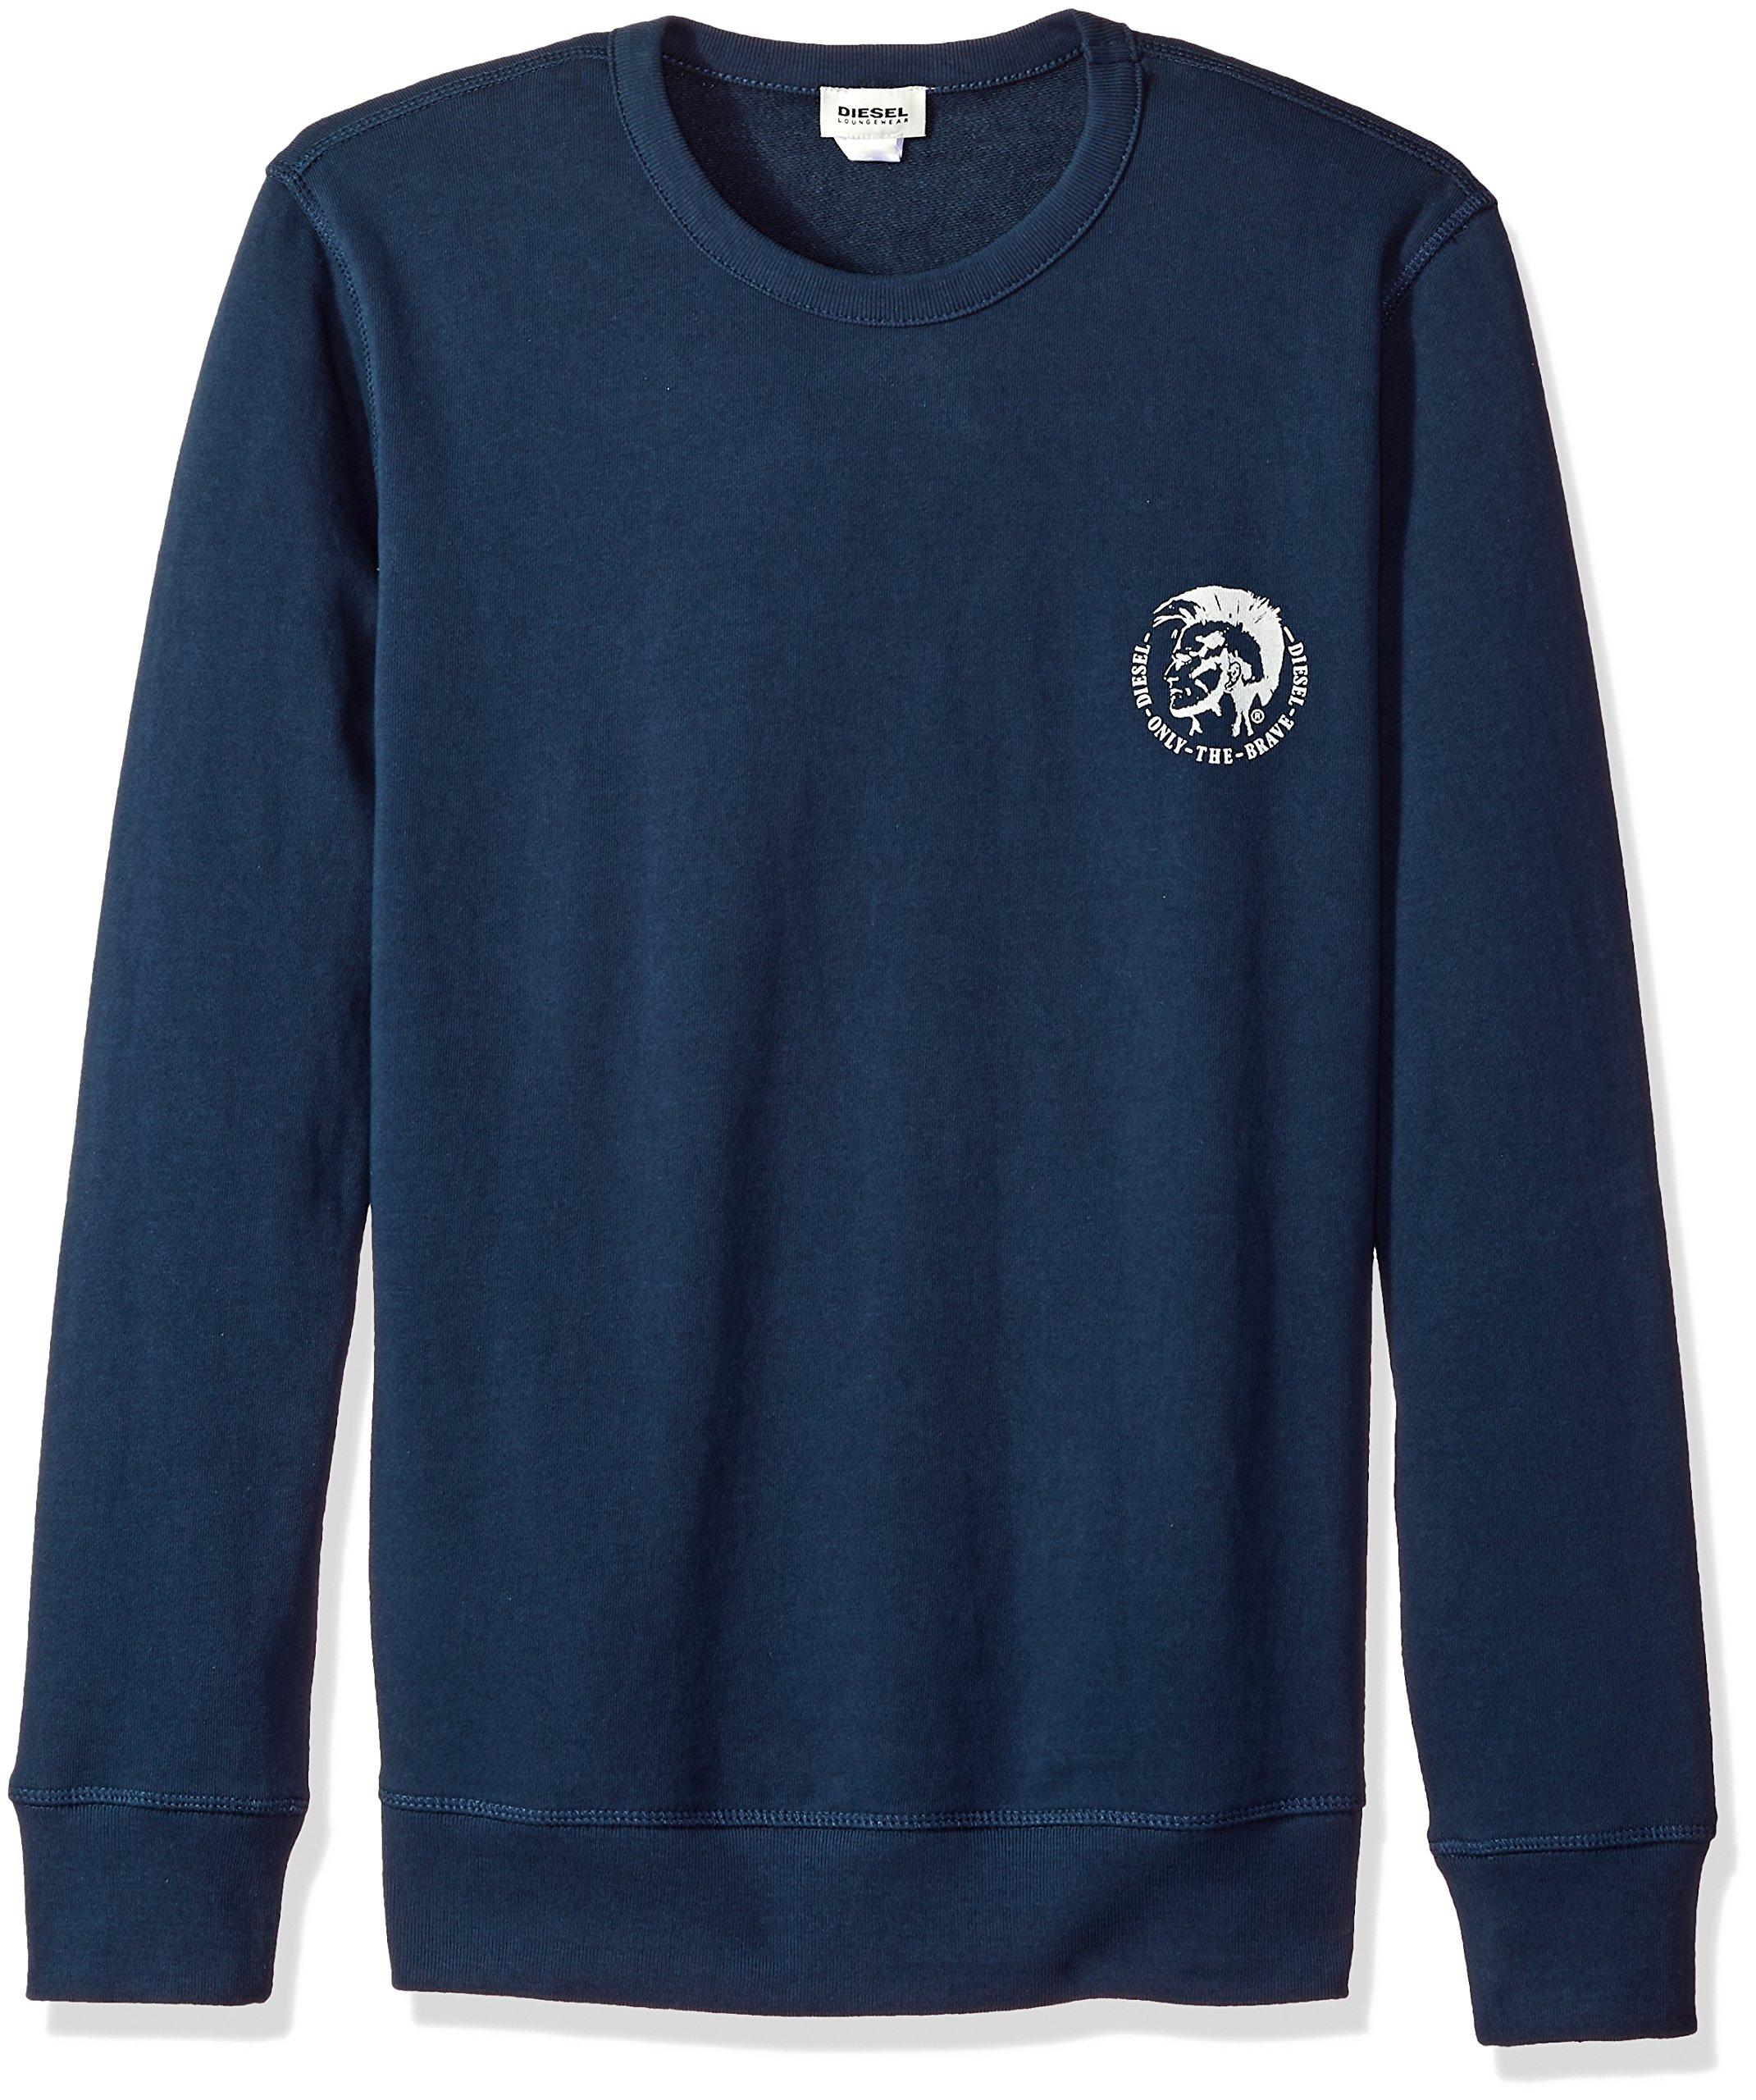 Diesel Men's Willy Mohican Lounge Crew Sweat Shirt, Navy, XXL